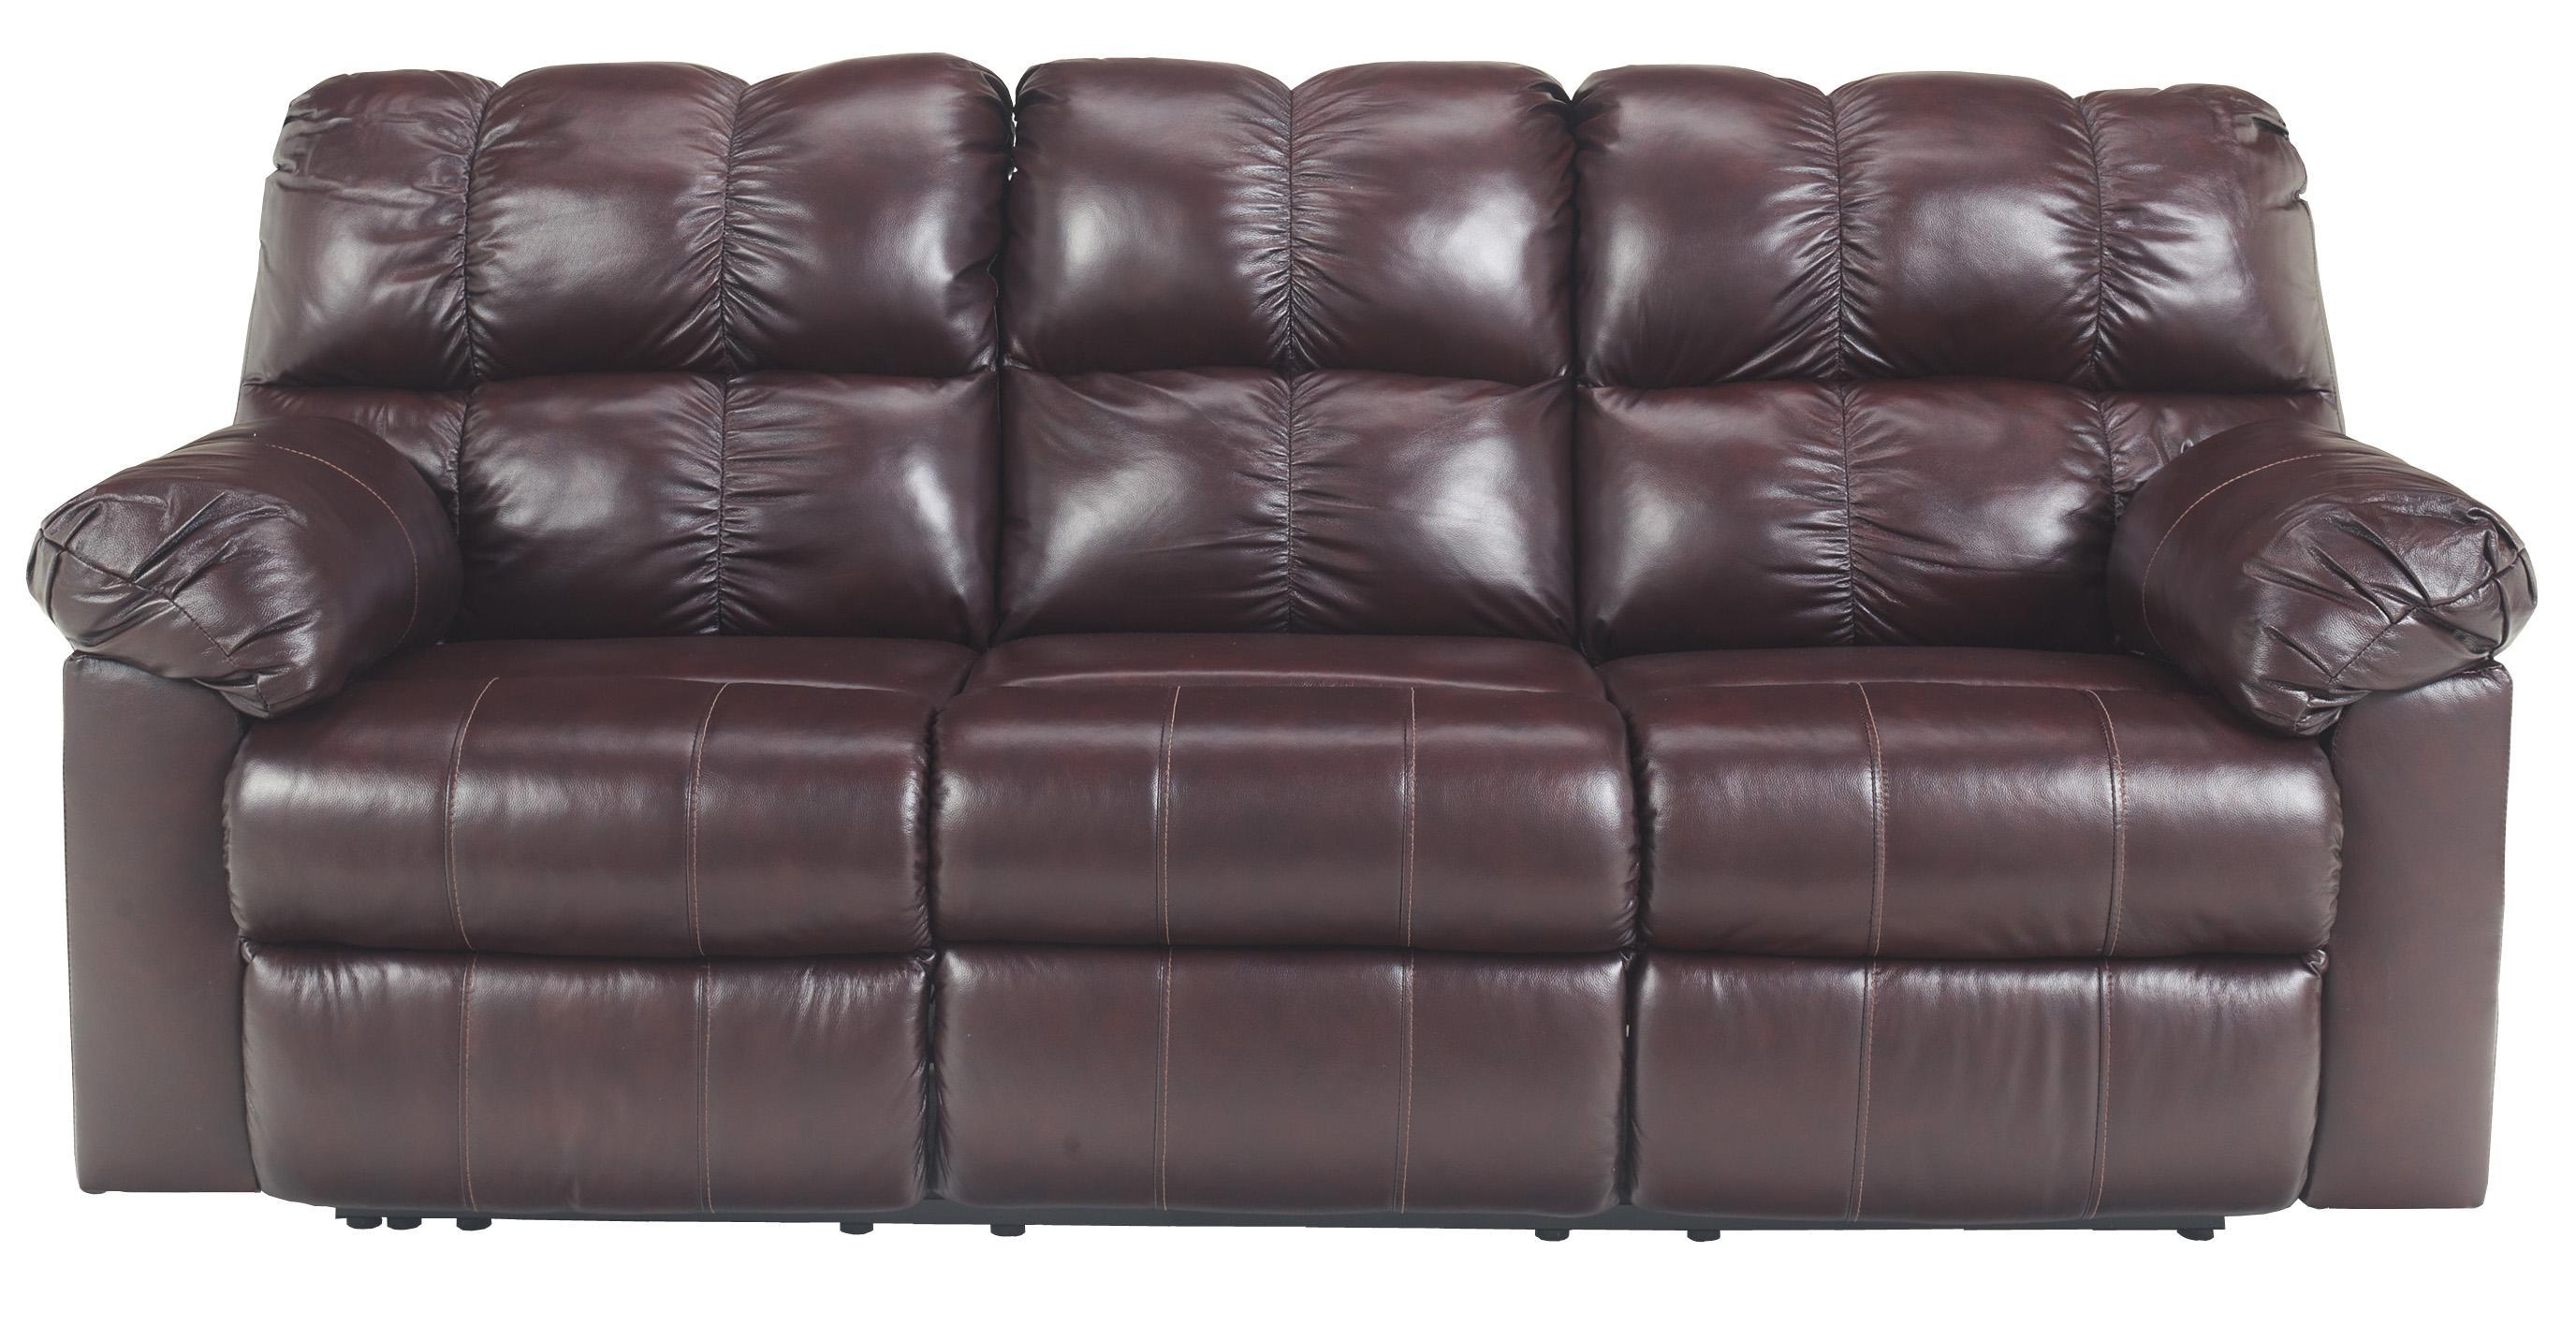 Signature Design by Ashley Kennard - Burgundy Reclining Sofa w/ Power - Item Number: 2900087